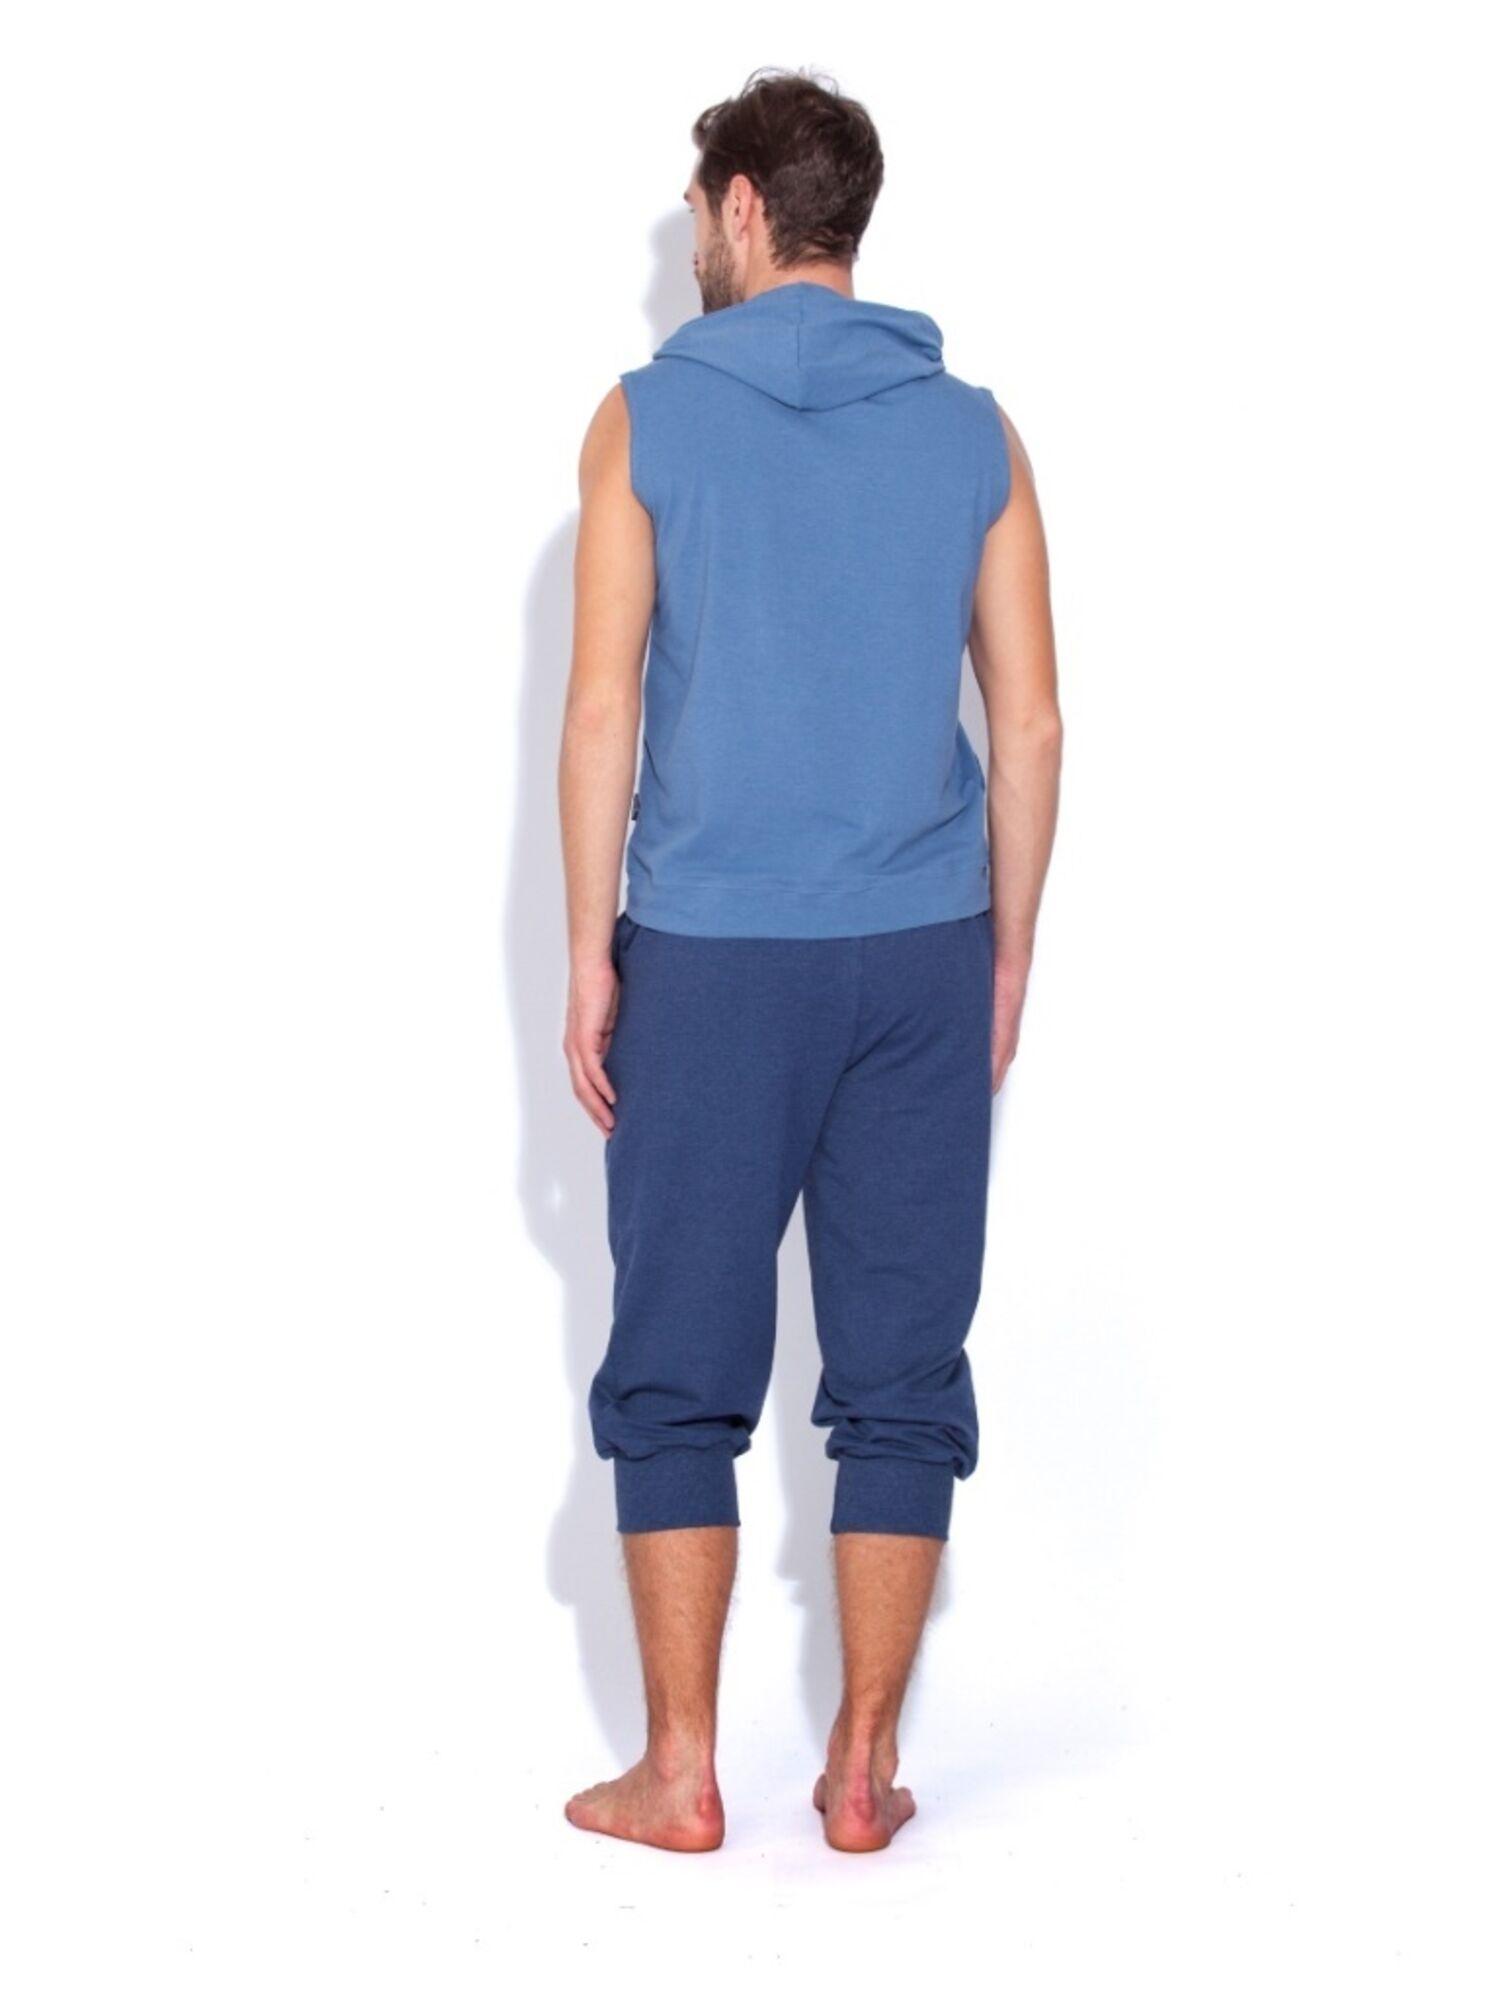 Костюм мужской спортивный DYNAMIC 35 синий, Peche Monnaie (Россия)